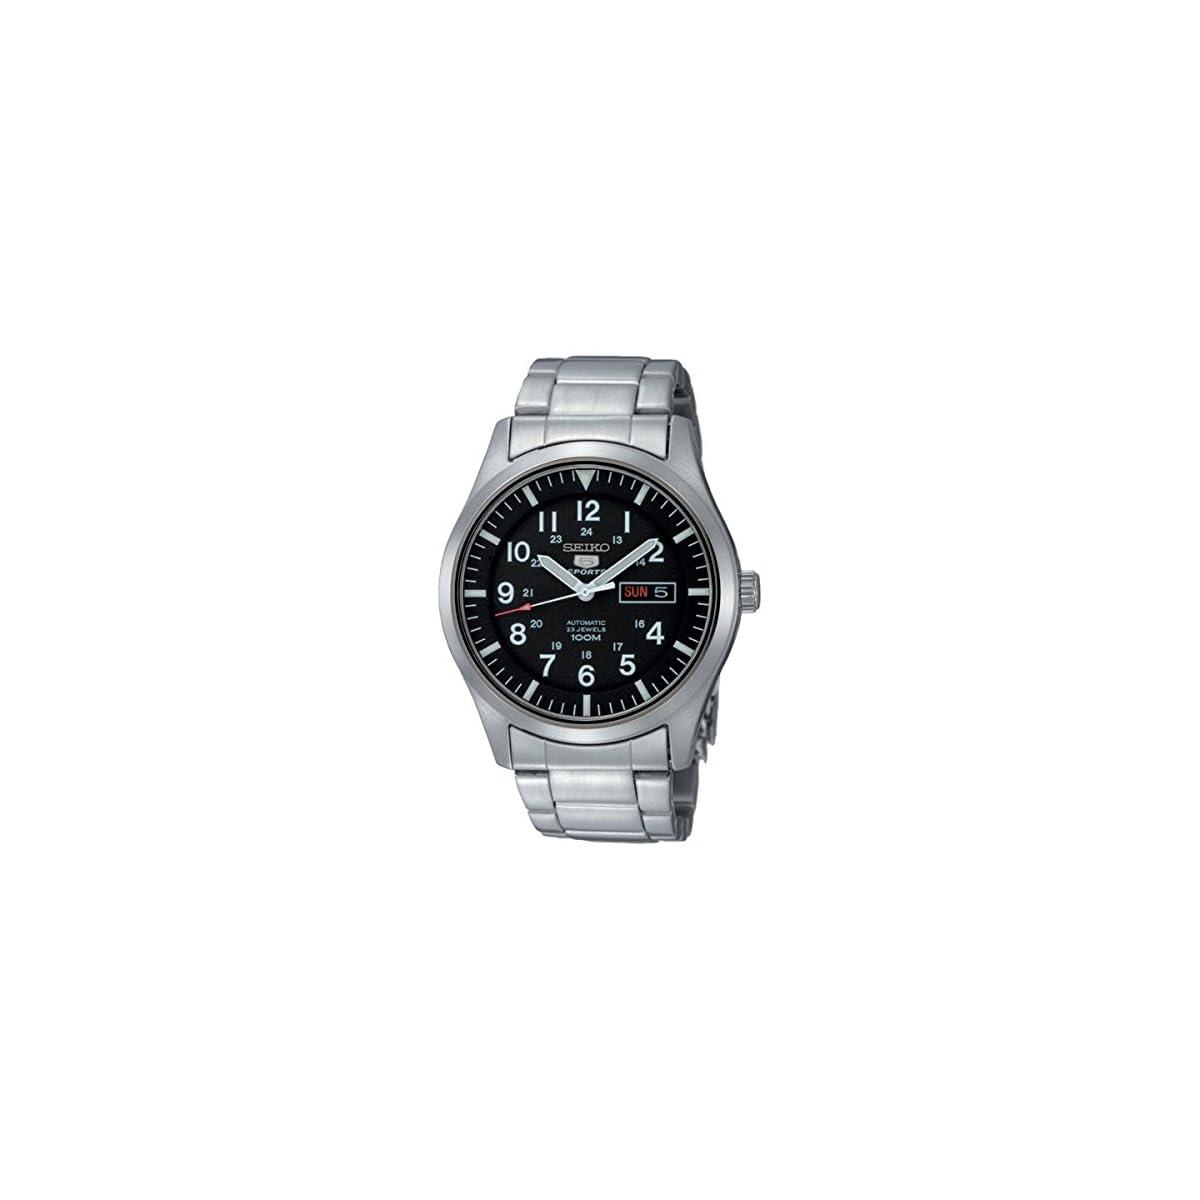 51Dghk5tJOL. SS1200  - Seiko Reloj Analógico Automático para Hombre con Correa de Acero Inoxidable - SNZG13K1